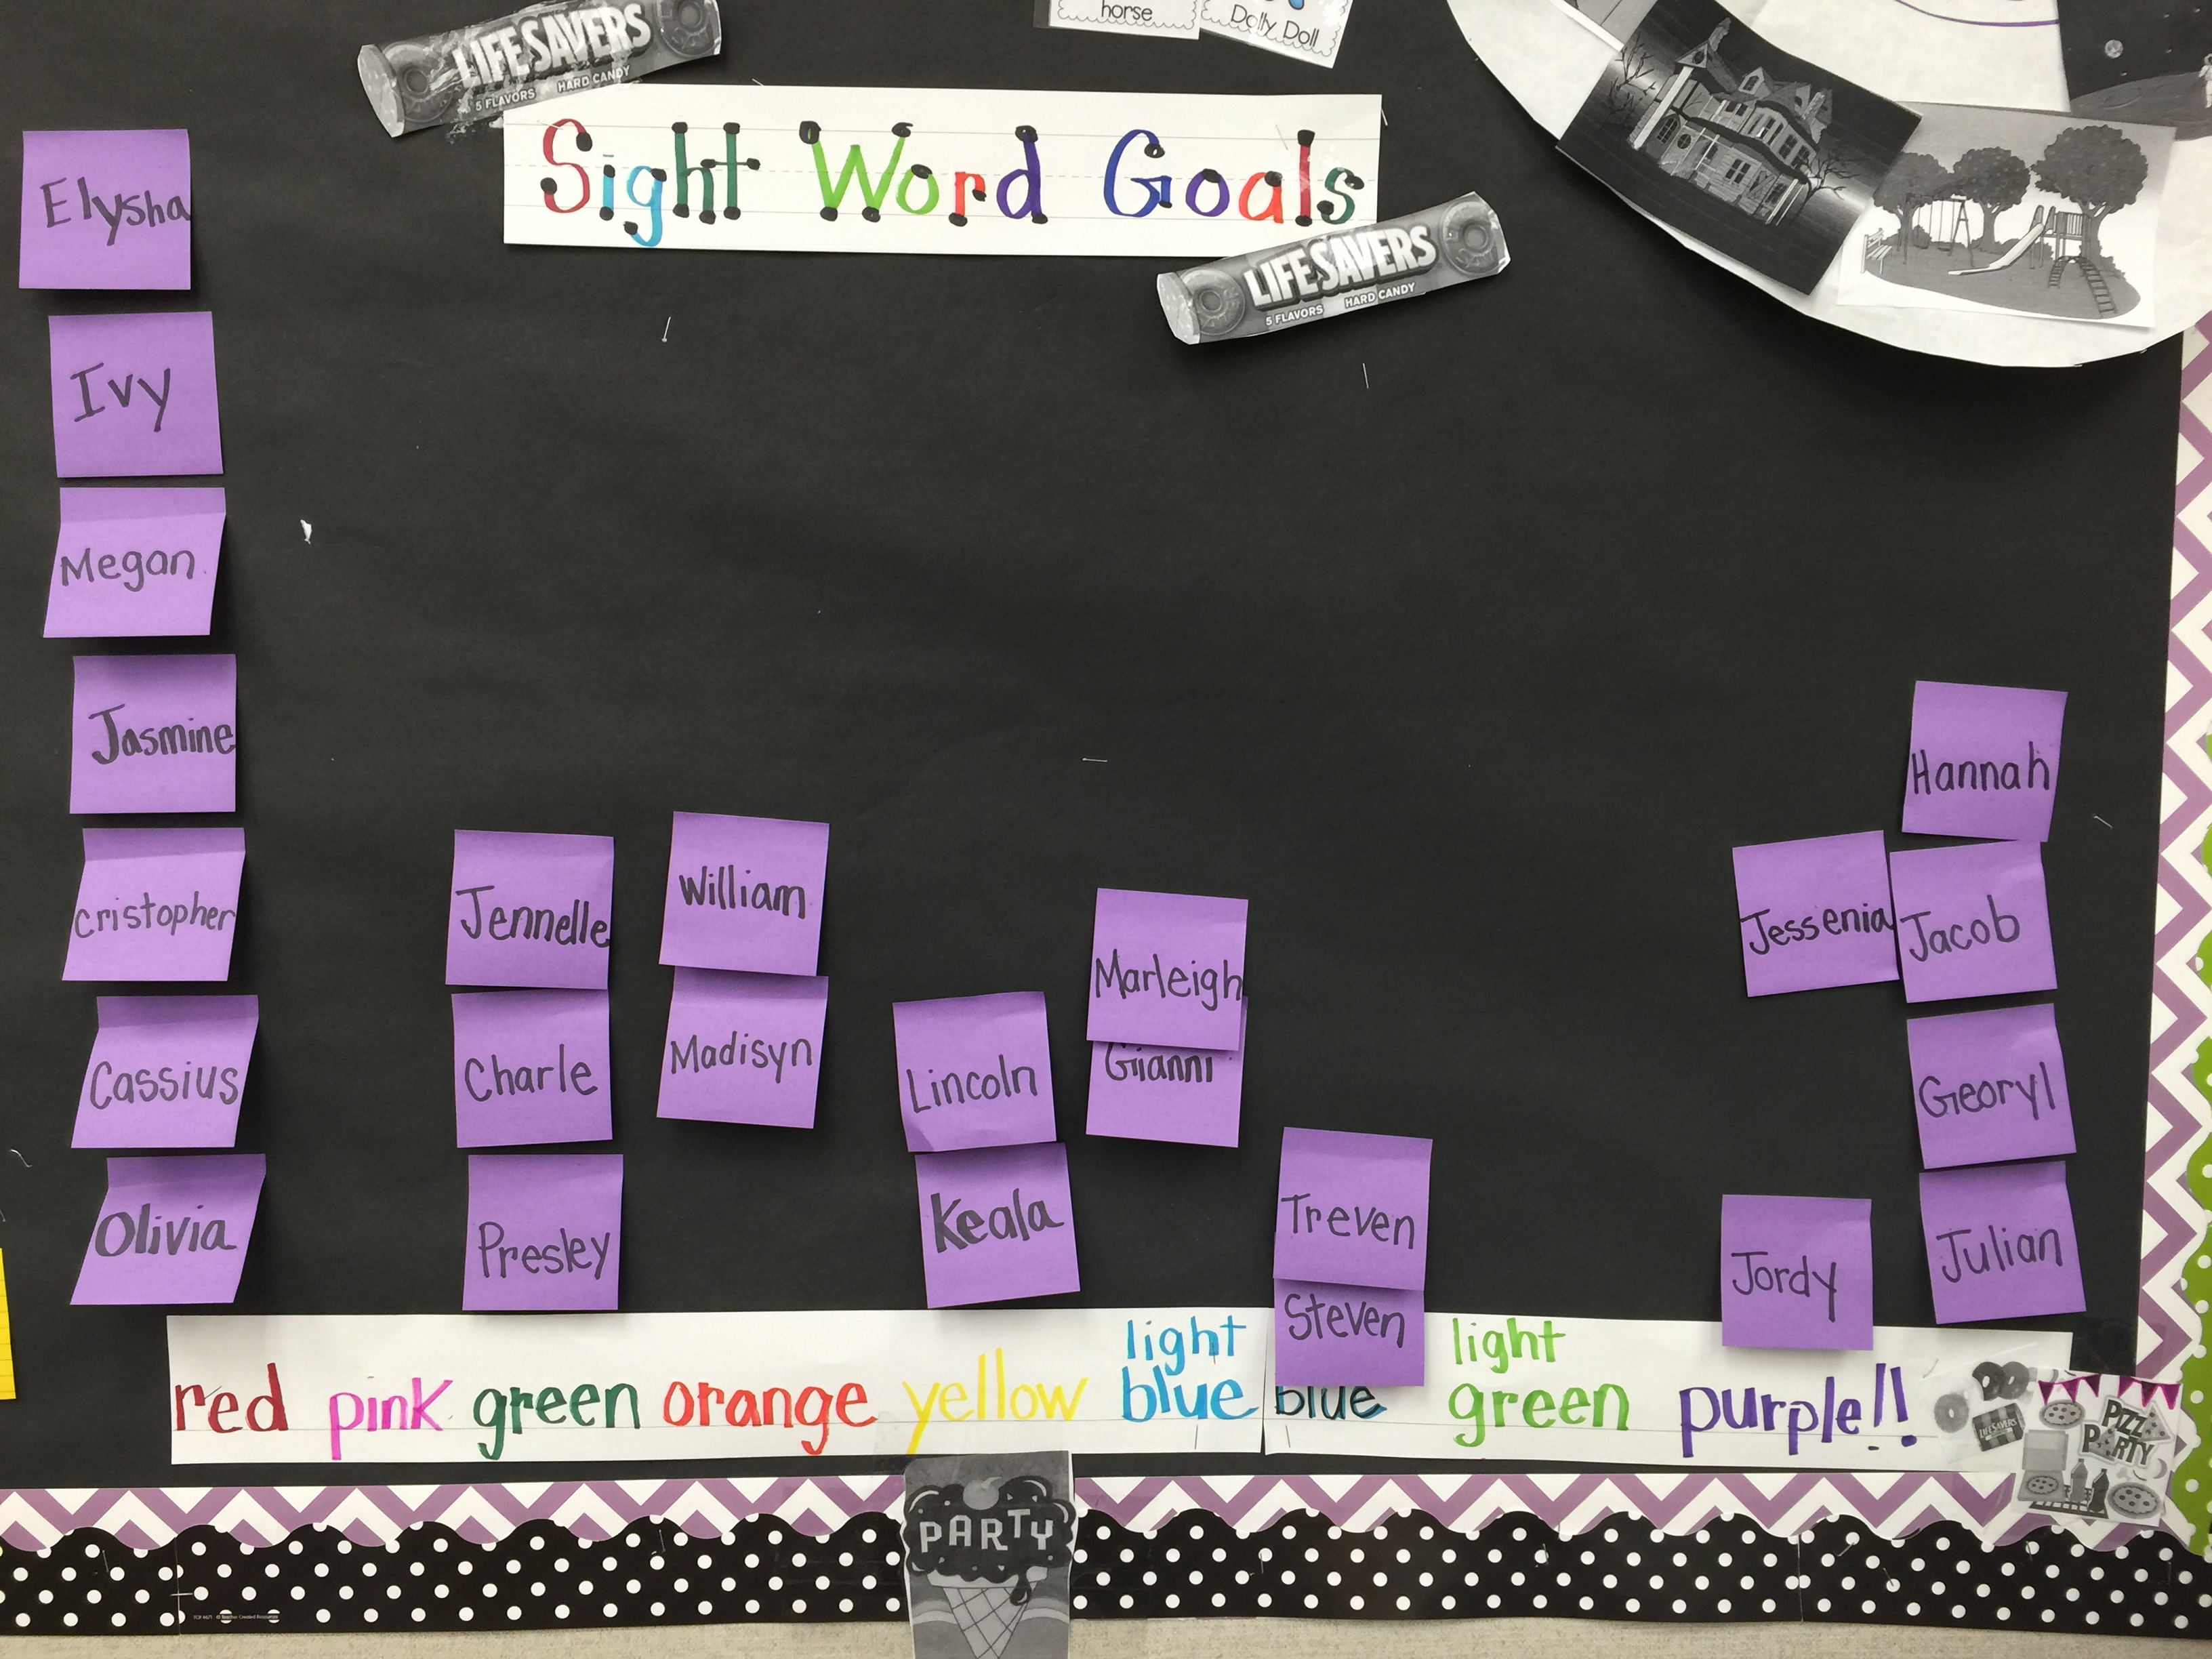 Worksheet Sight Word Program sweet sight words a word program for the kinder classroom 2015 03 27 14 06 01